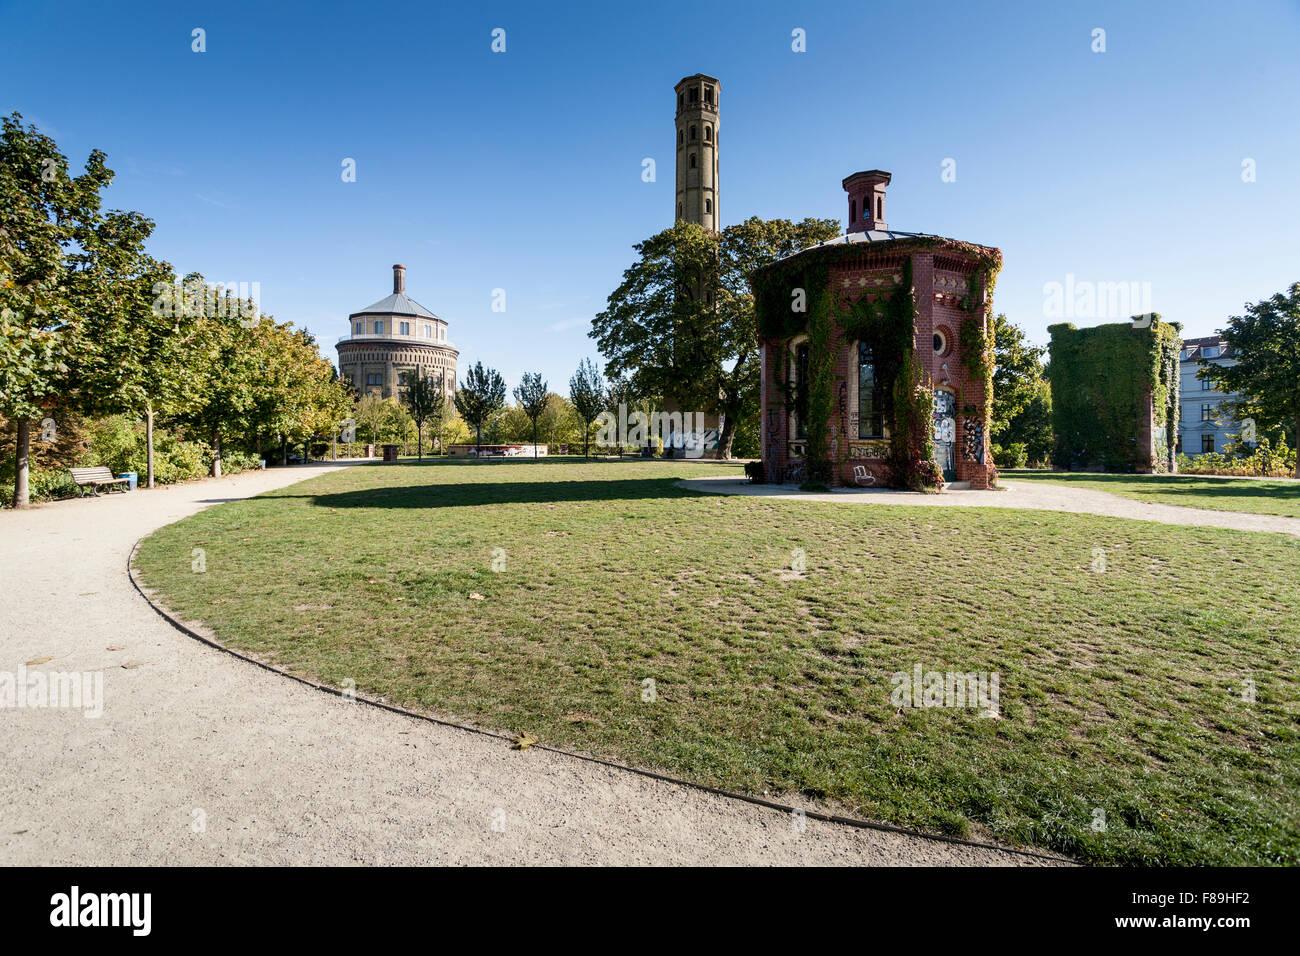 Water tower, Prenzlauer Berg, Berlin, Germany - Stock Image